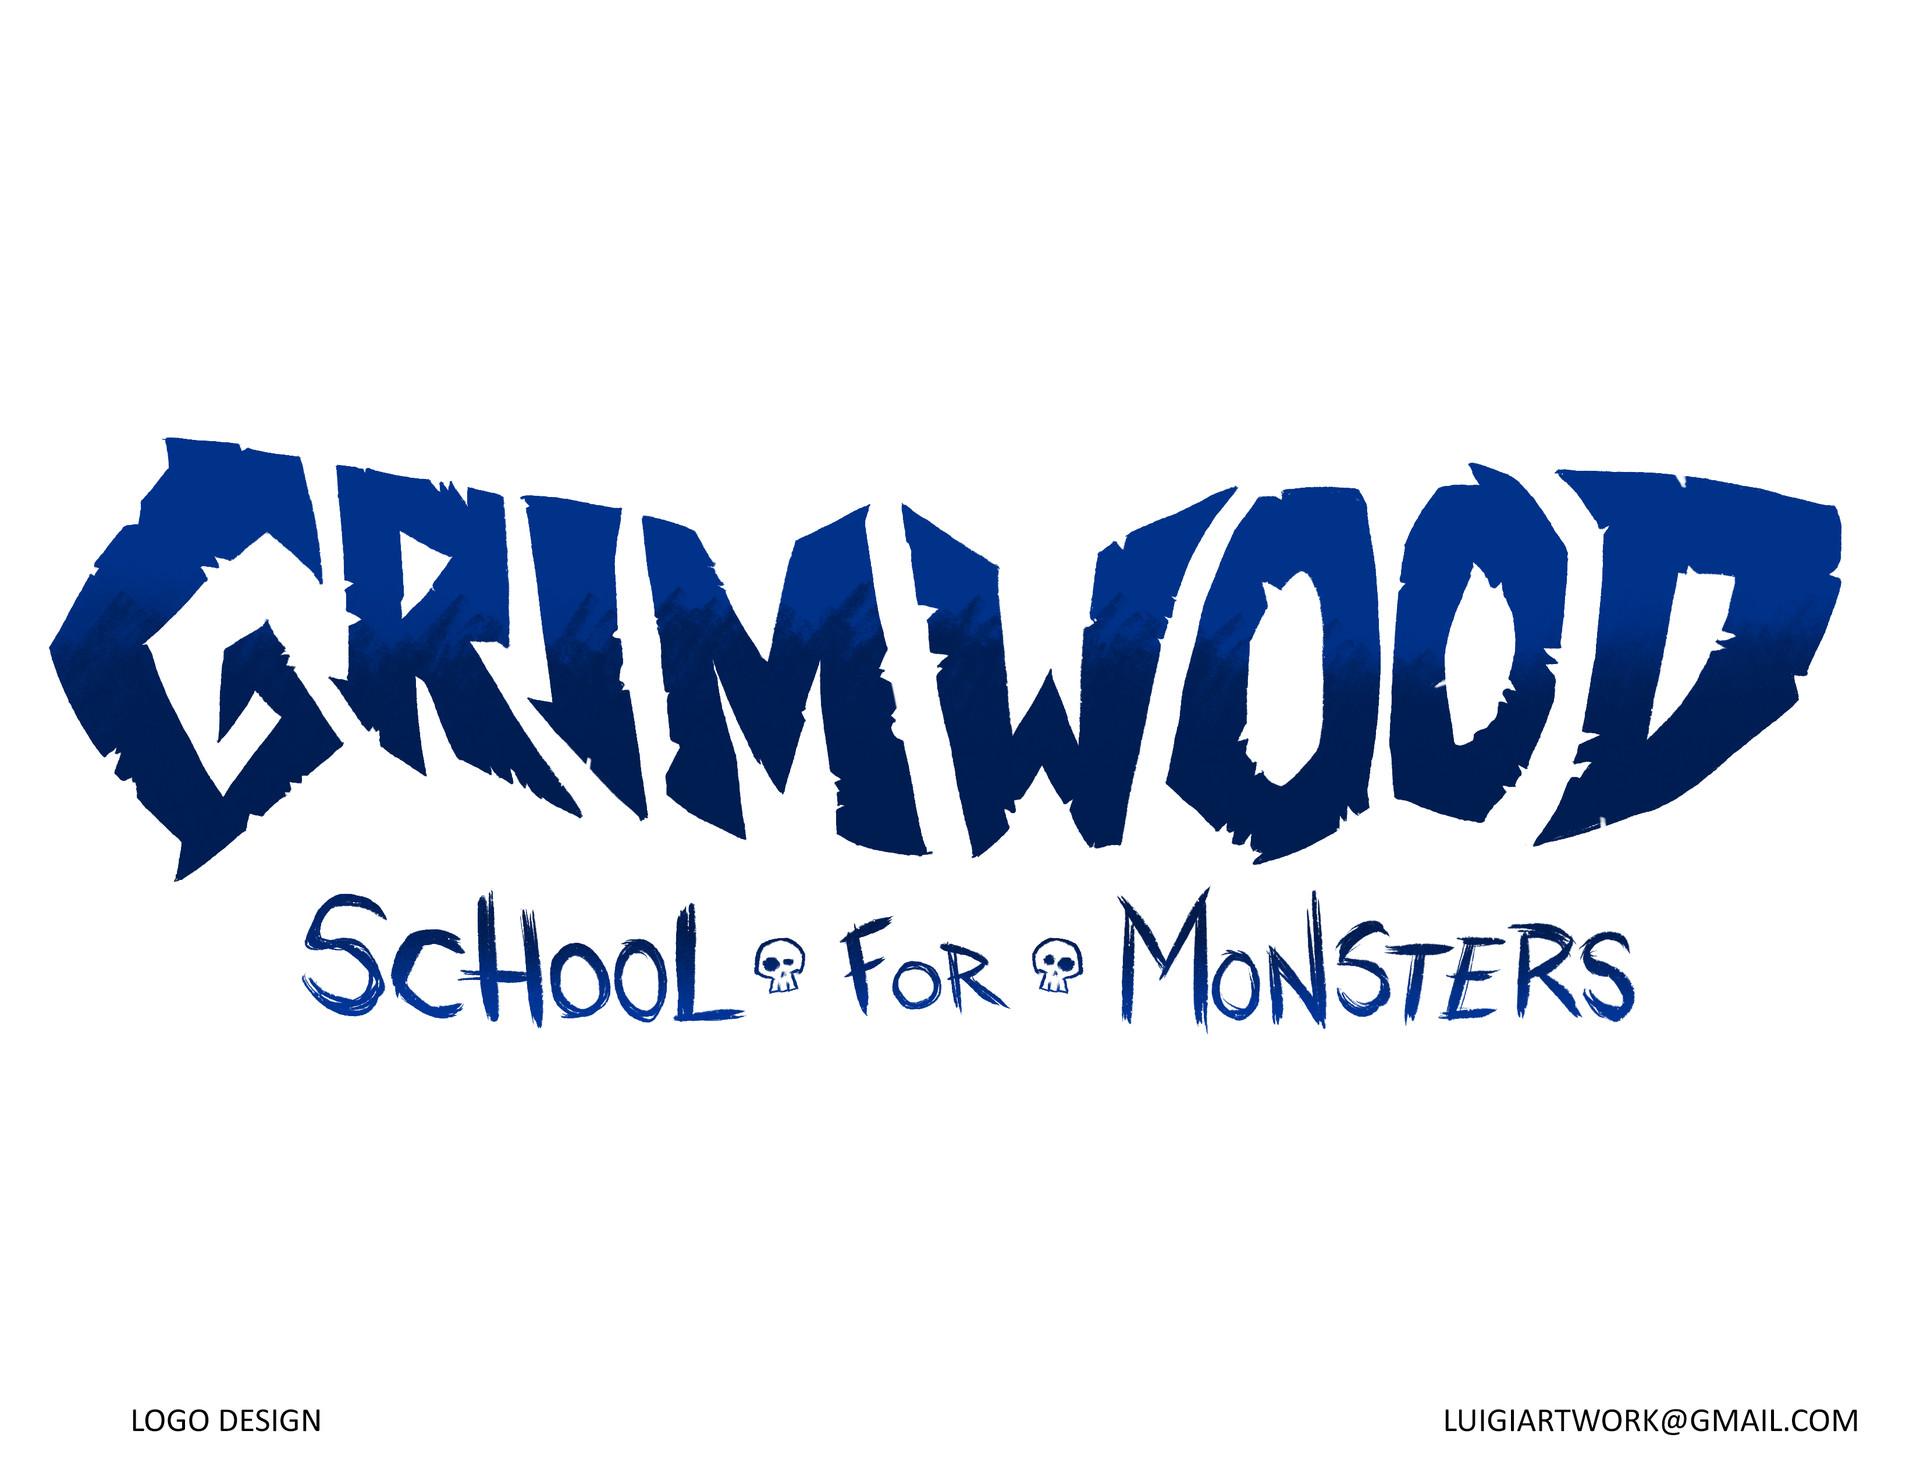 Luigi lucarelli 1 grimwood logo